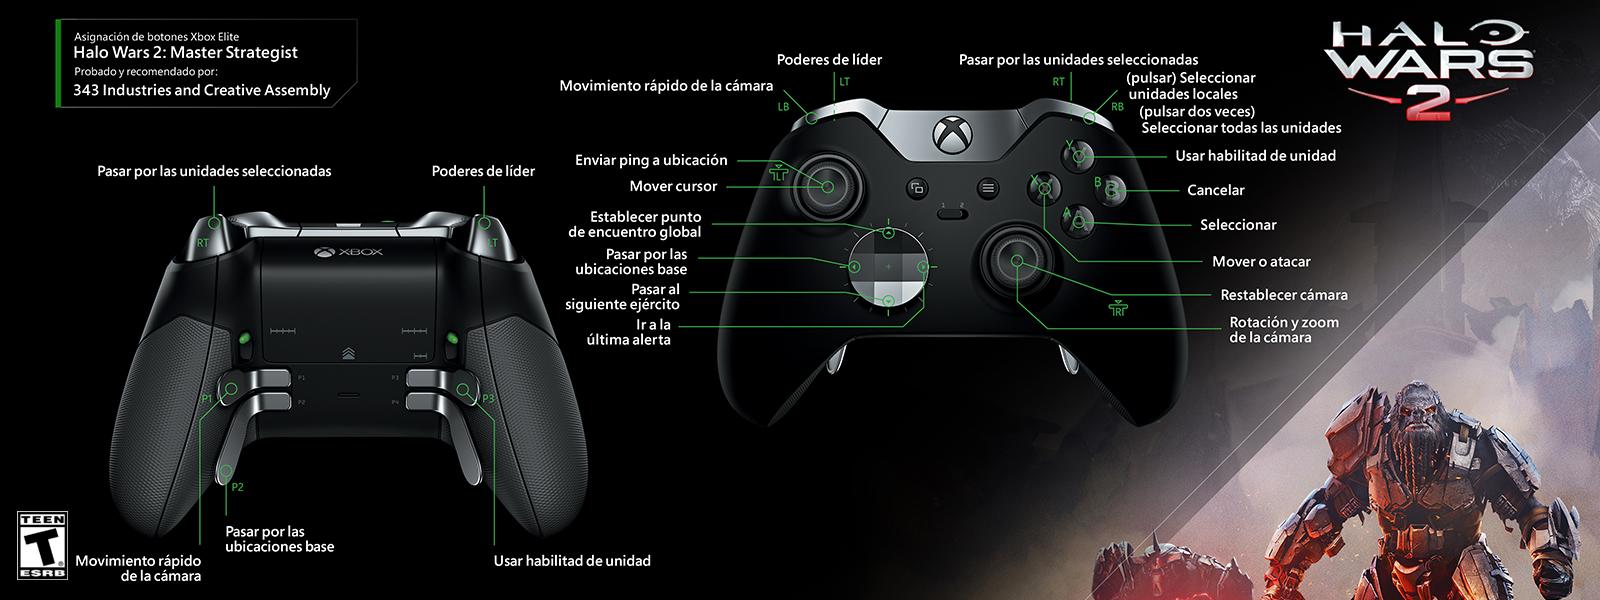 Halo Wars 2: estratega maestro